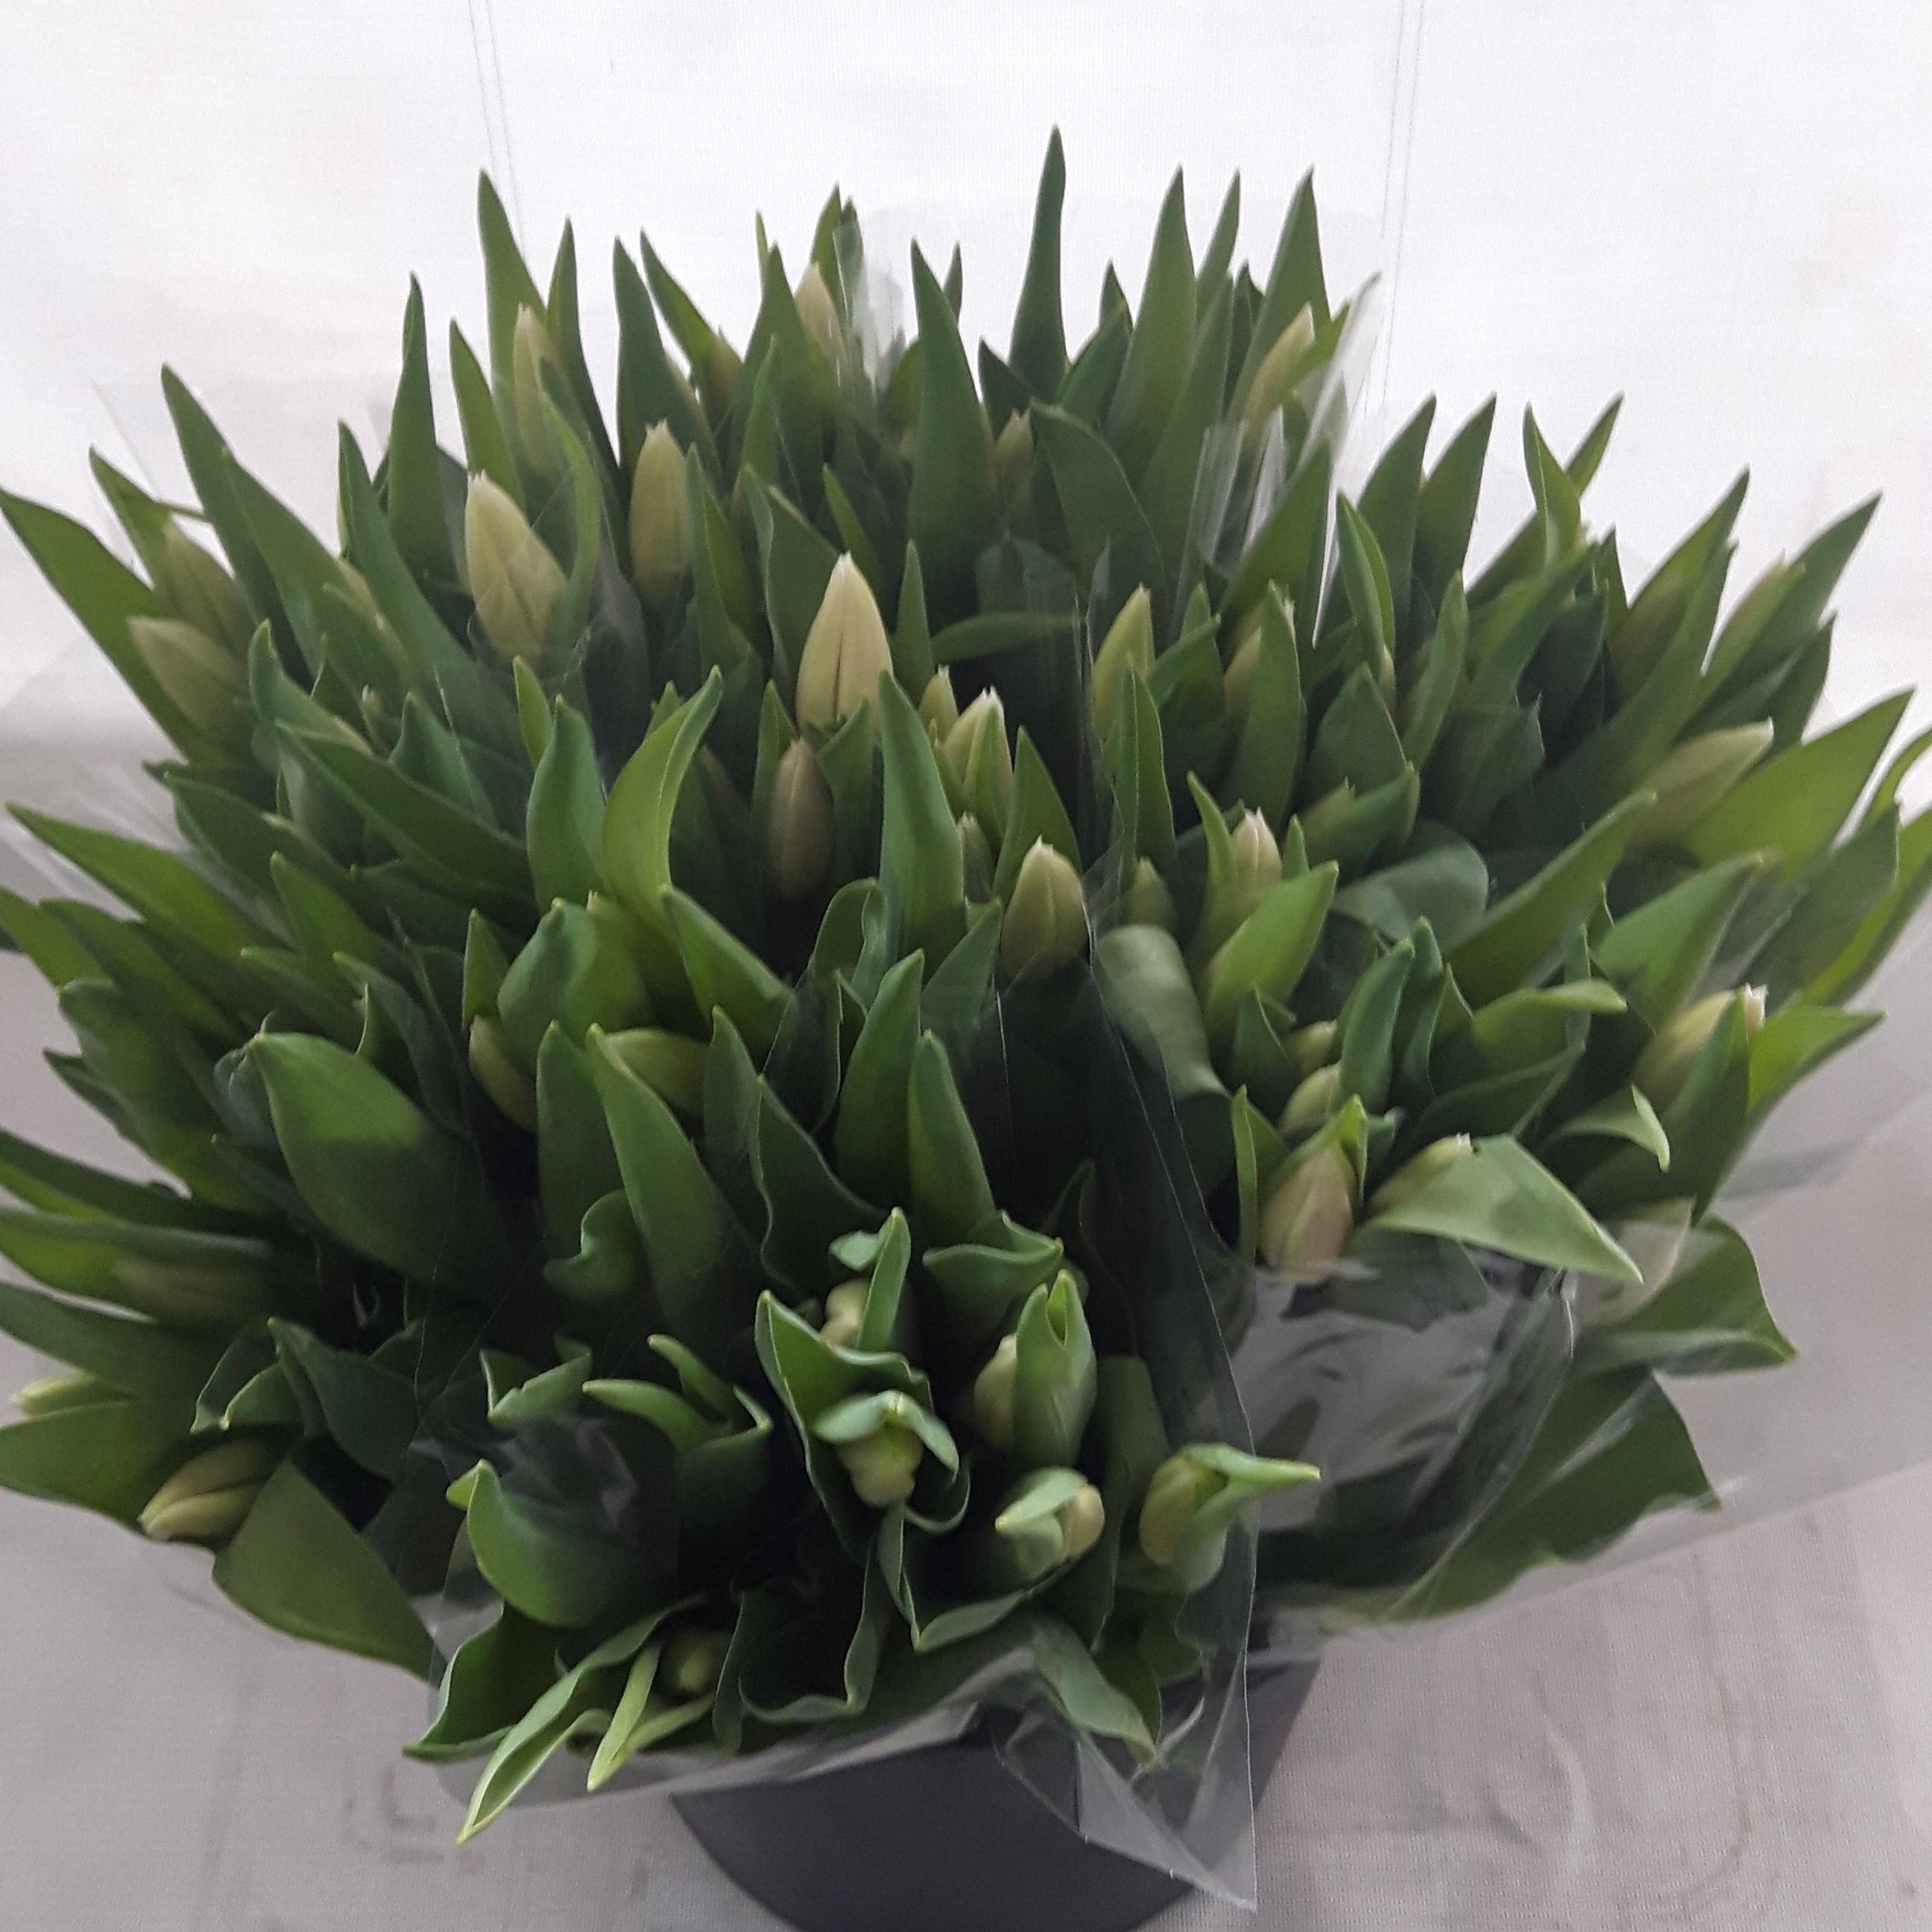 Tulp wit ingehoesd in 5 liter emmer